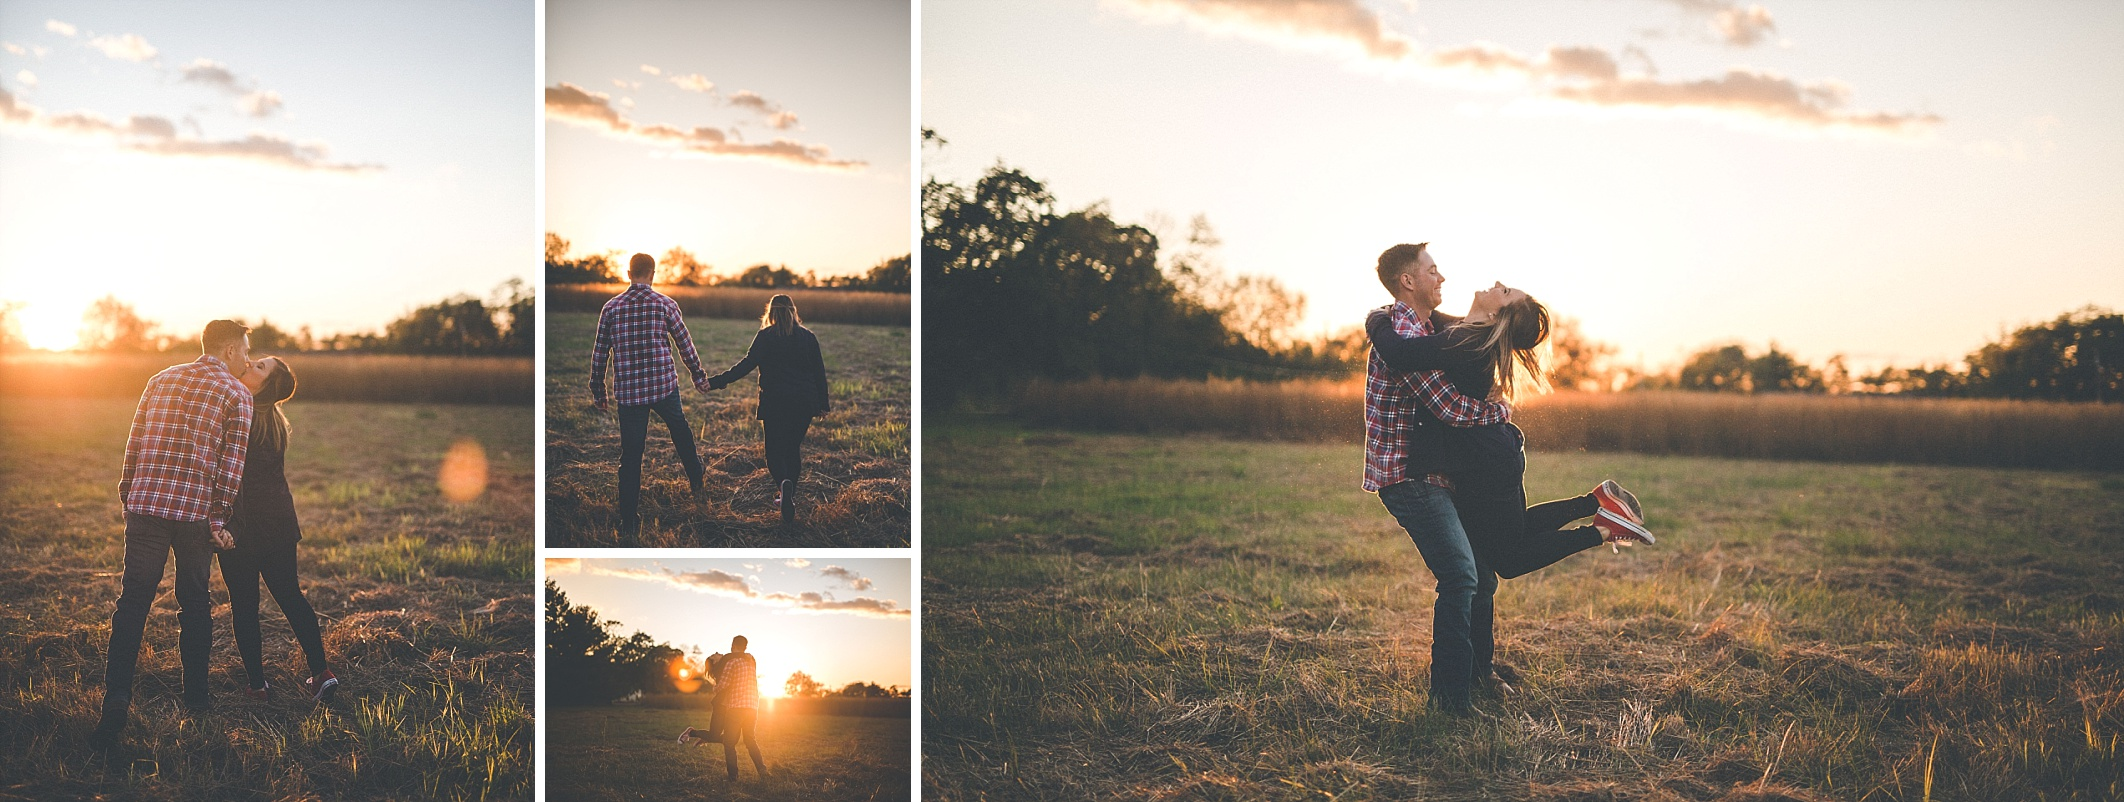 wedding-photographer-dayton-ohio_0252.jpg